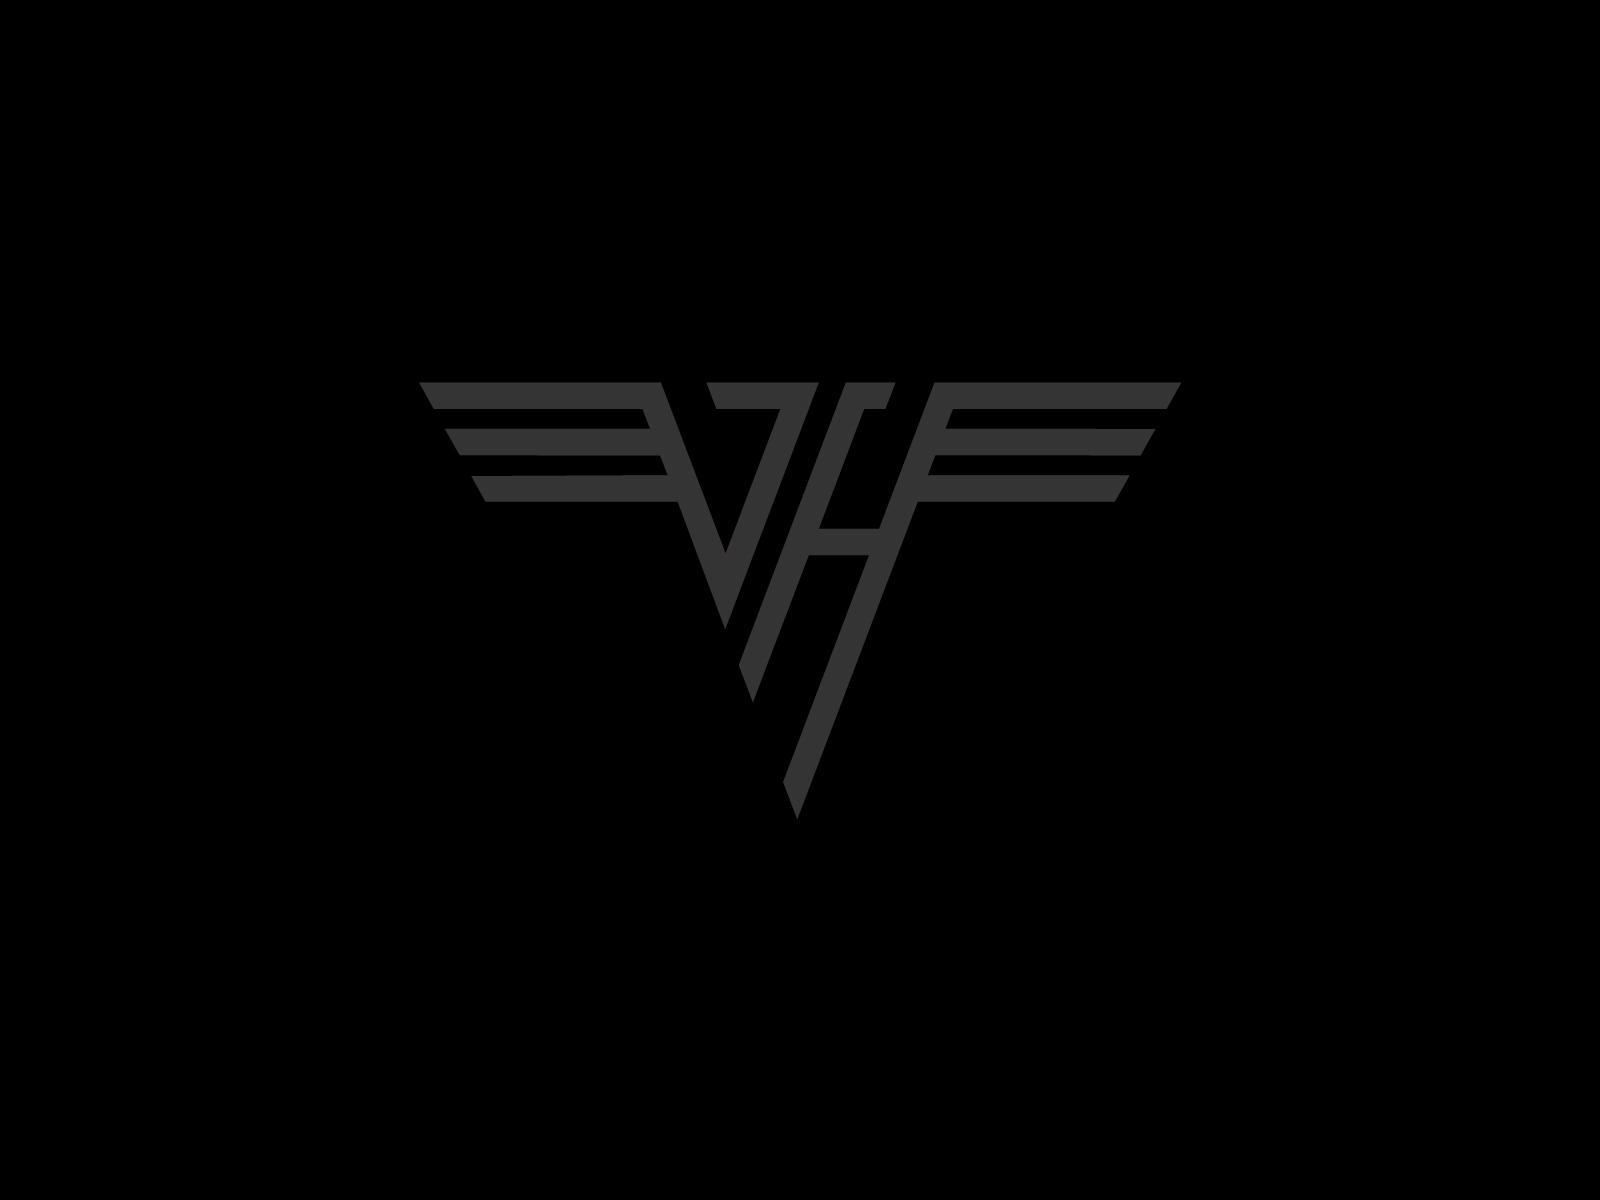 15 Van Halen HD Wallpapers | Backgrounds - Wallpaper Abyss